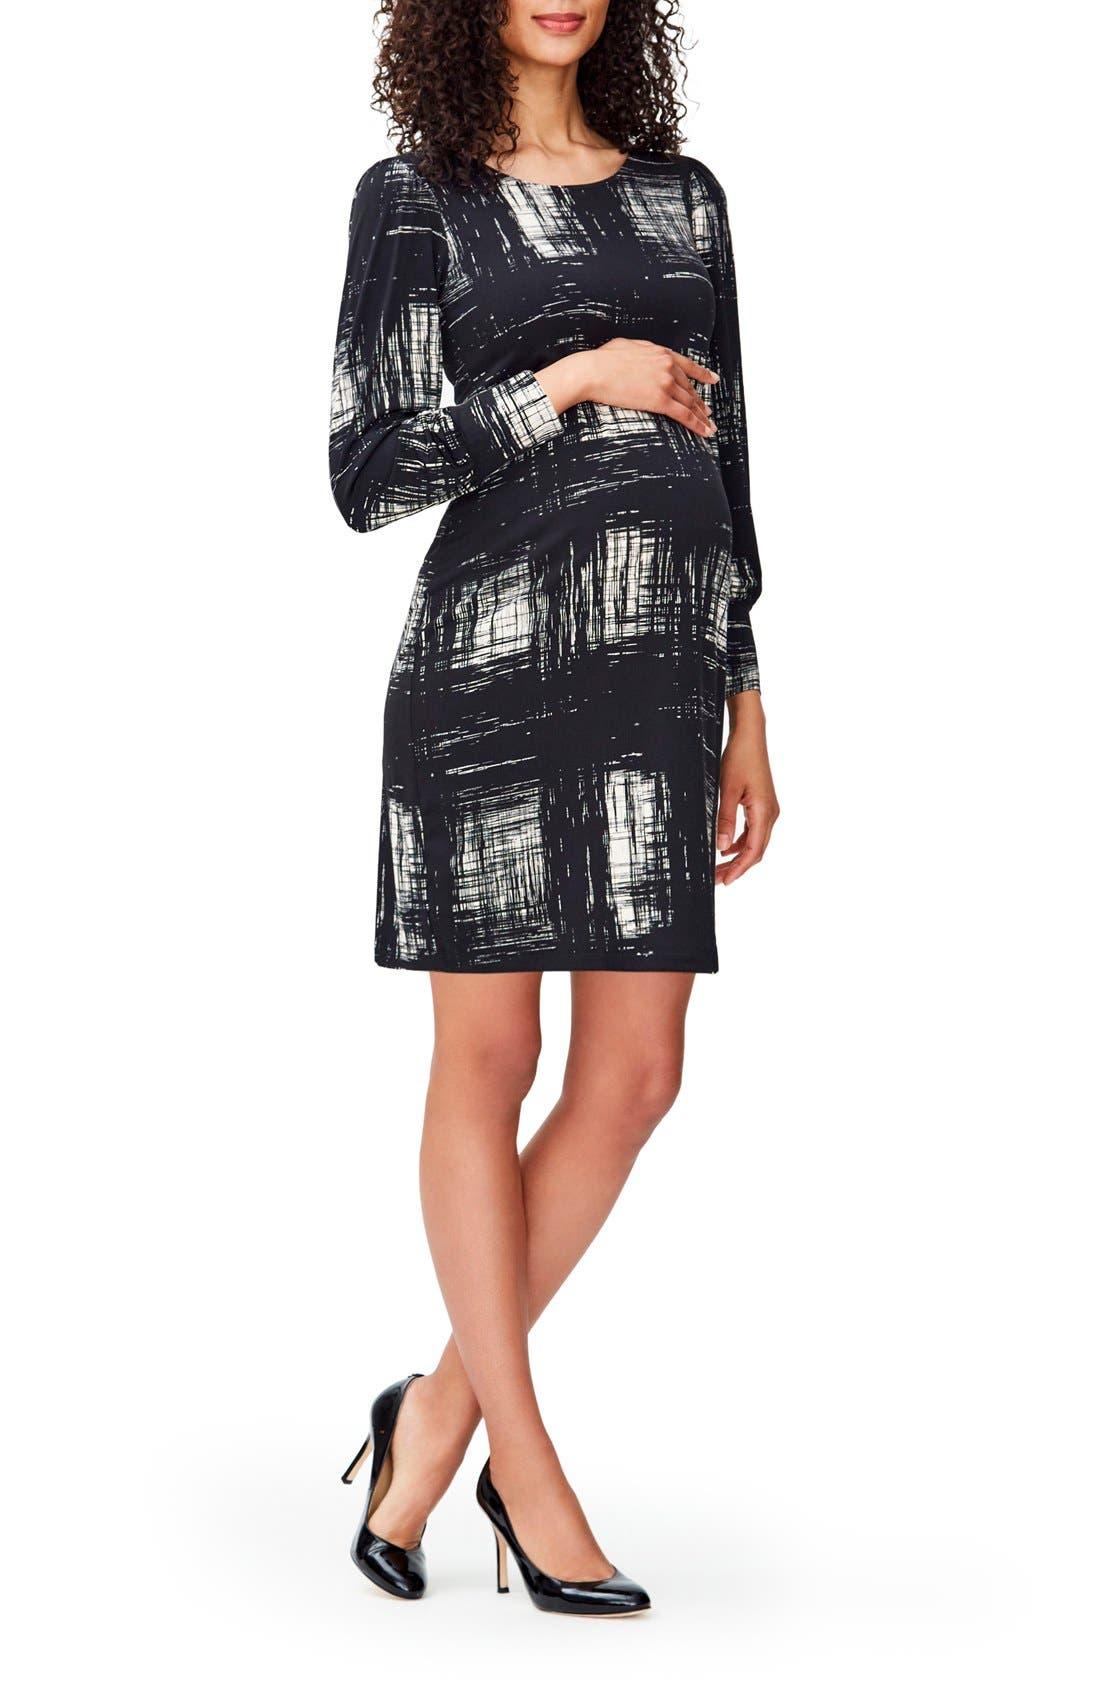 Main Image - Leota 'Kate' Maternity Dress